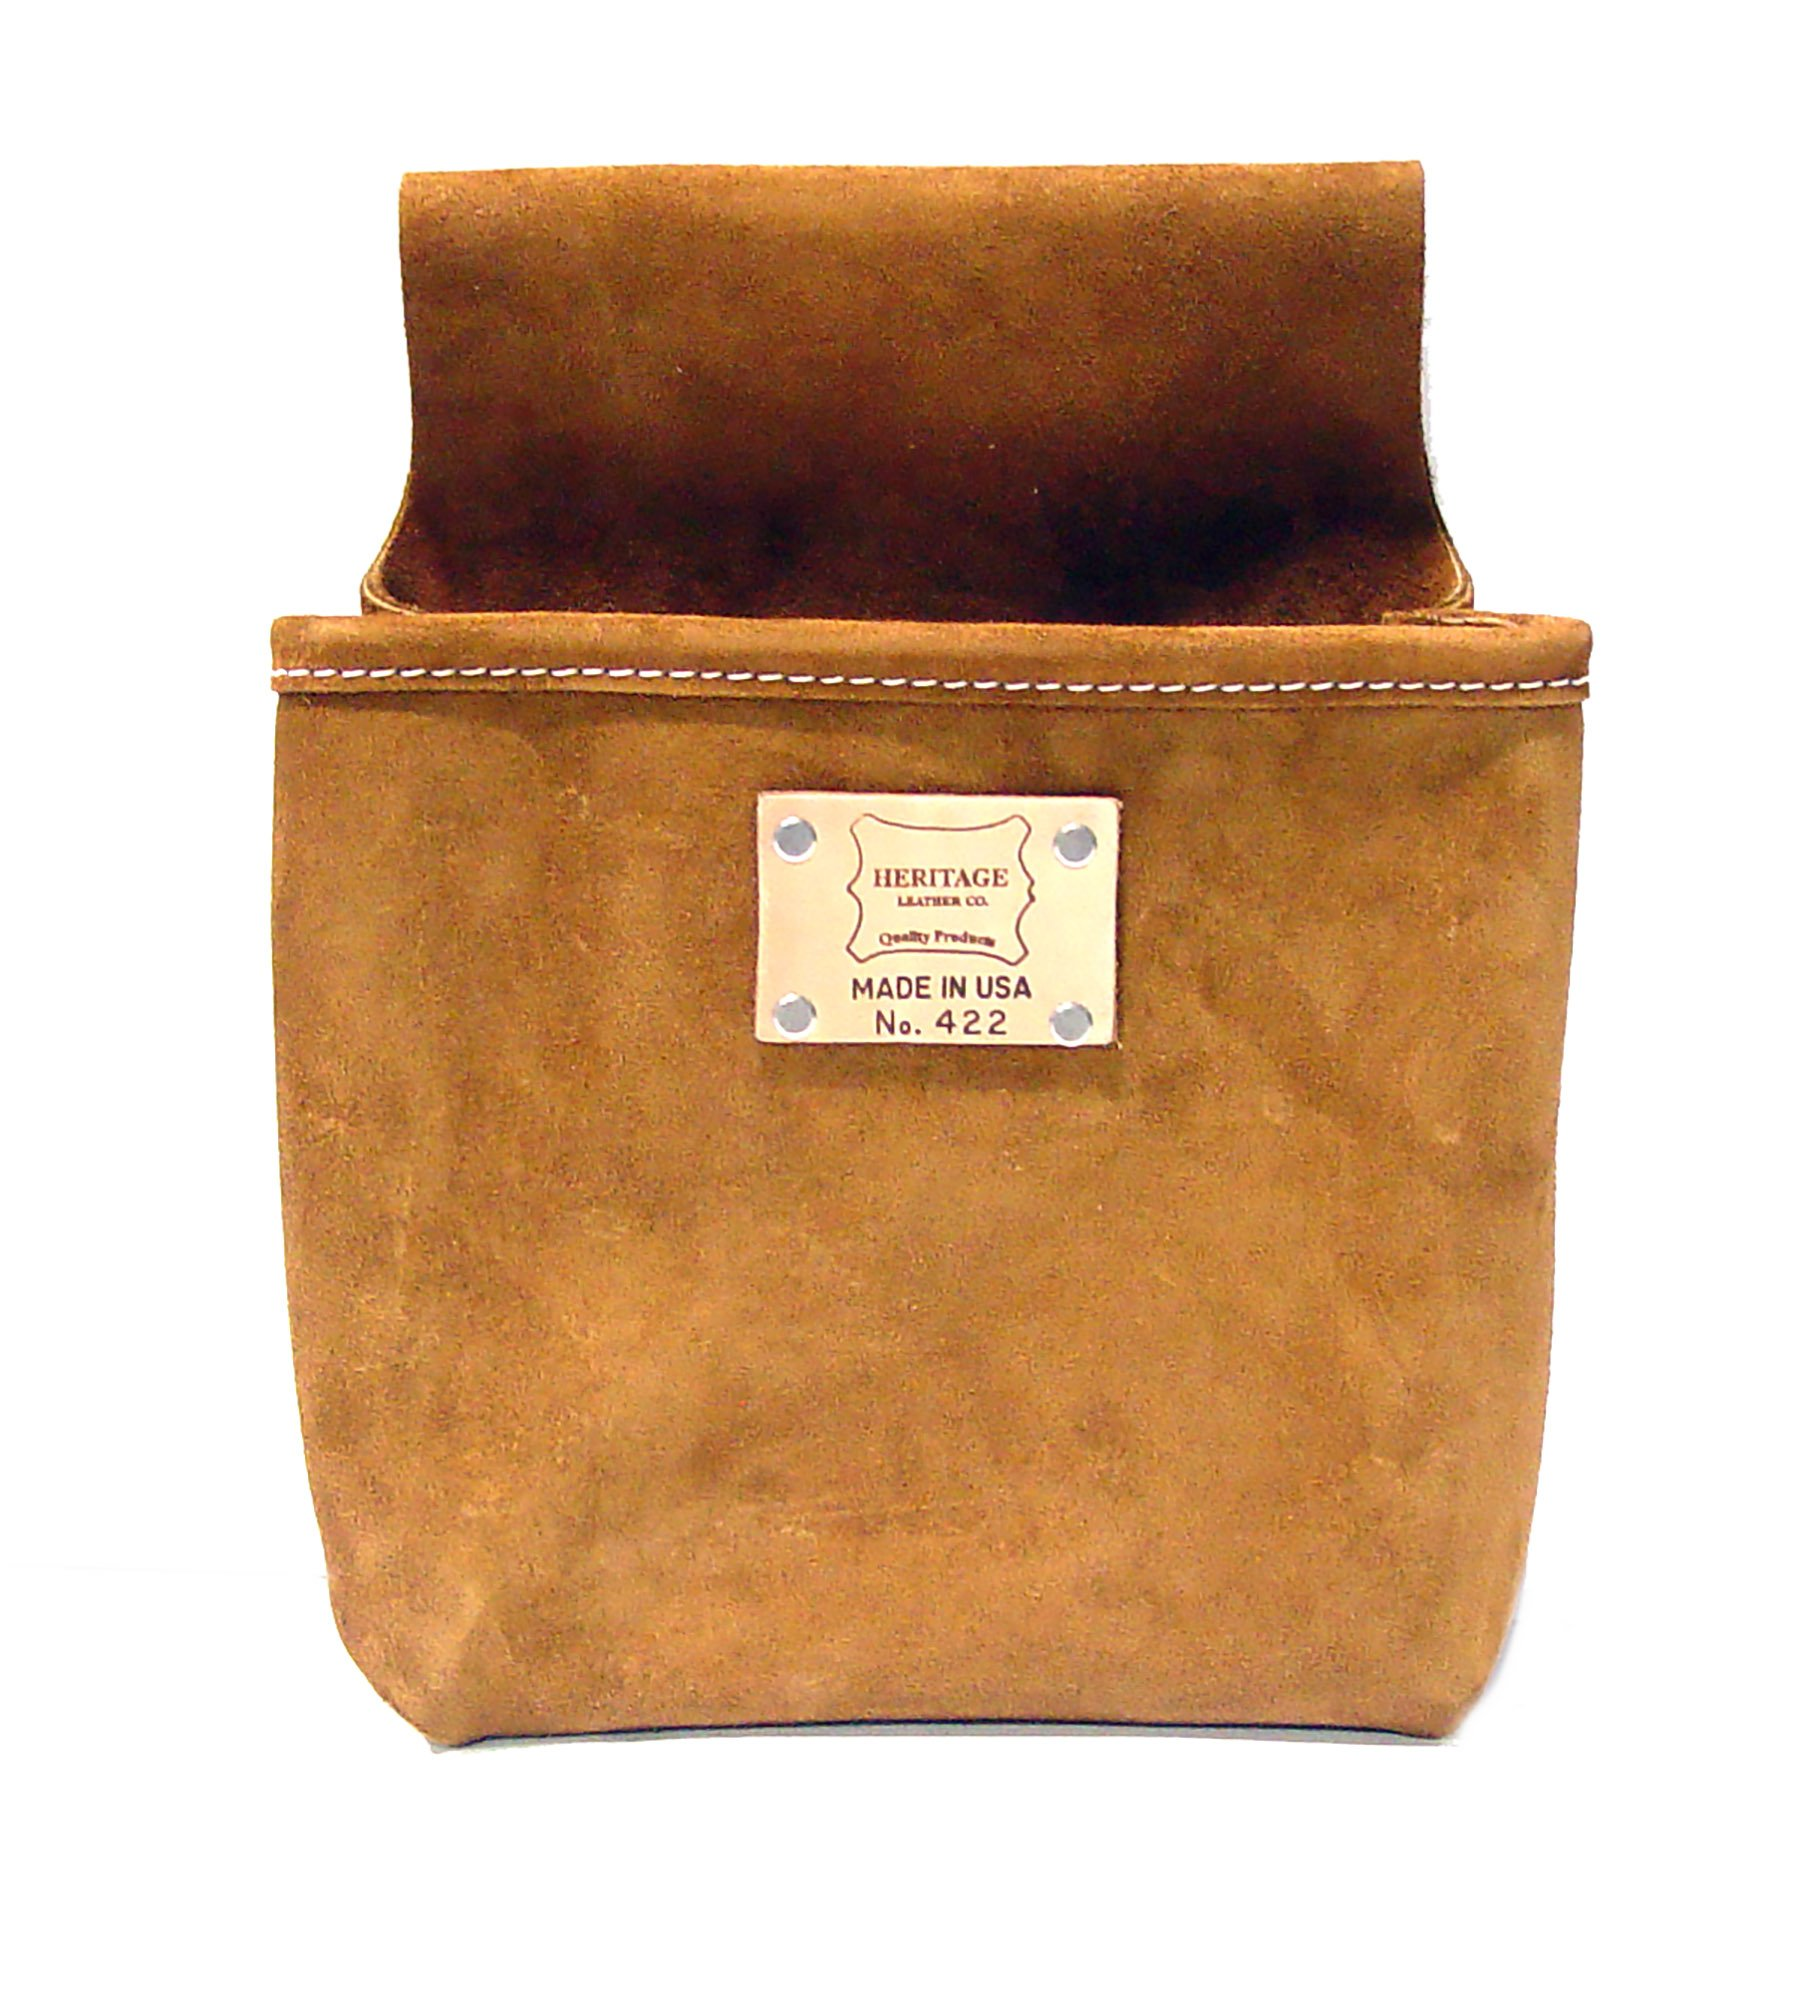 Heritage Leather 422 Single Pocket Professional Split Leather Nail Bag